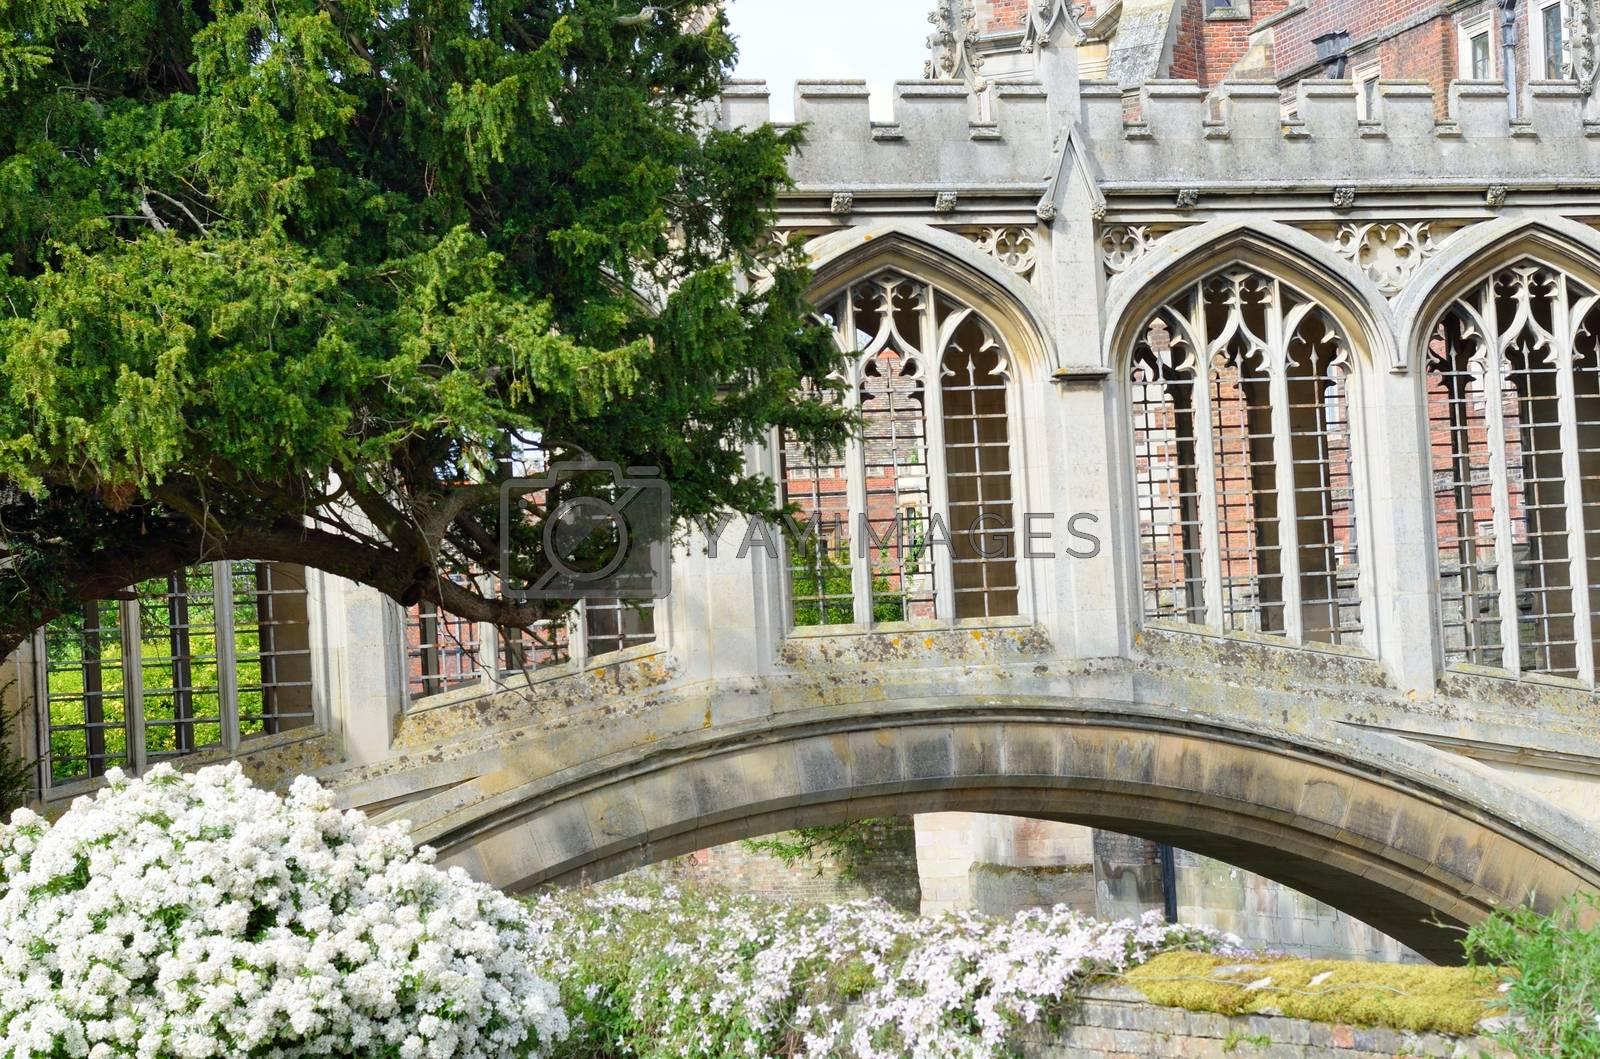 Bridge of Sighs Cambridge